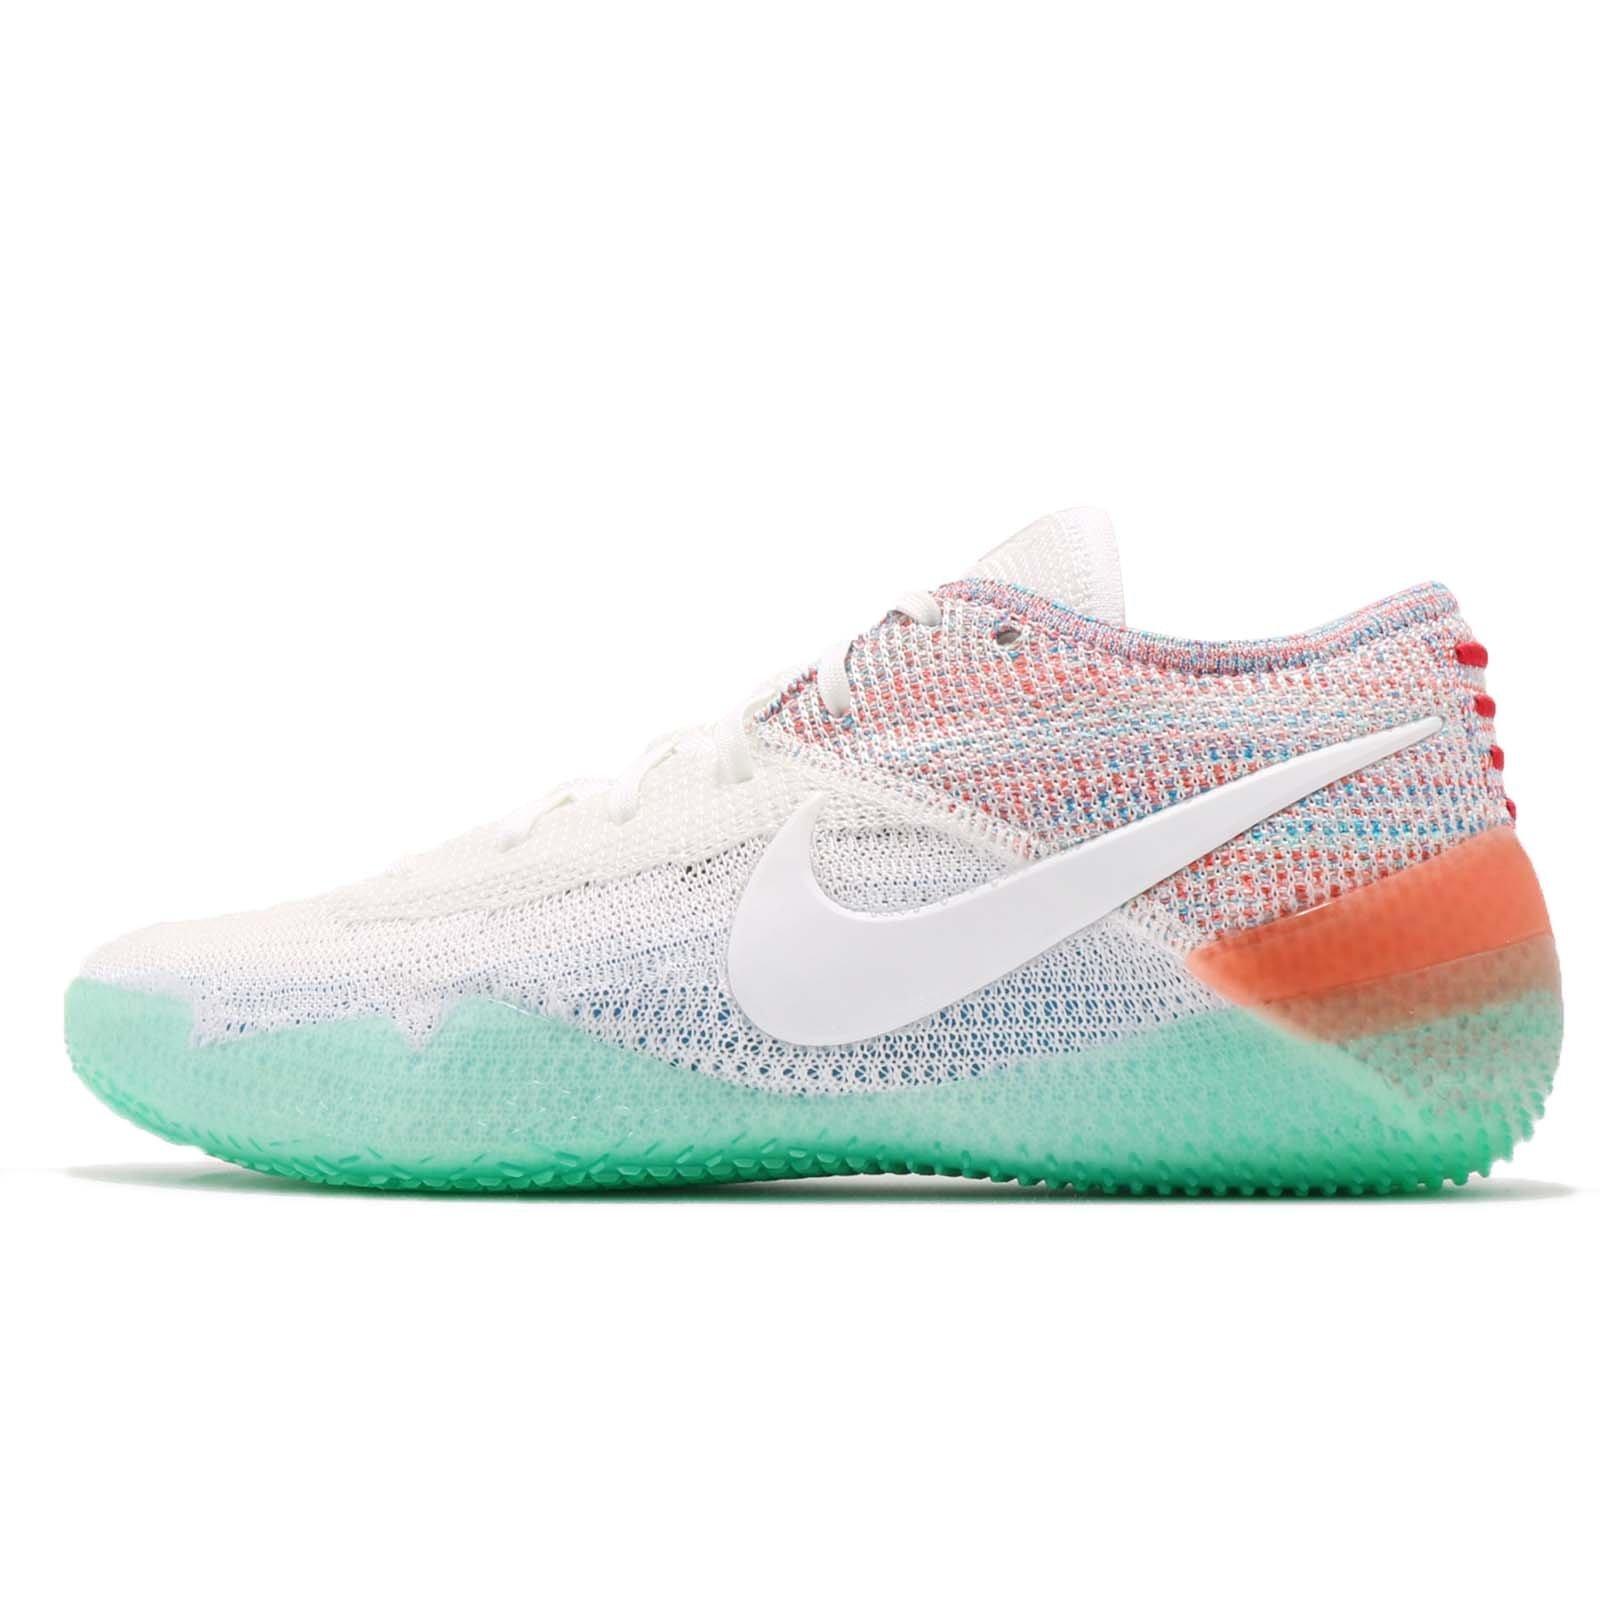 buy online 35547 7daf4 Galleon - Nike Men s Kobe A.D. NXT 360 Basketball Shoes (9, White Multi)